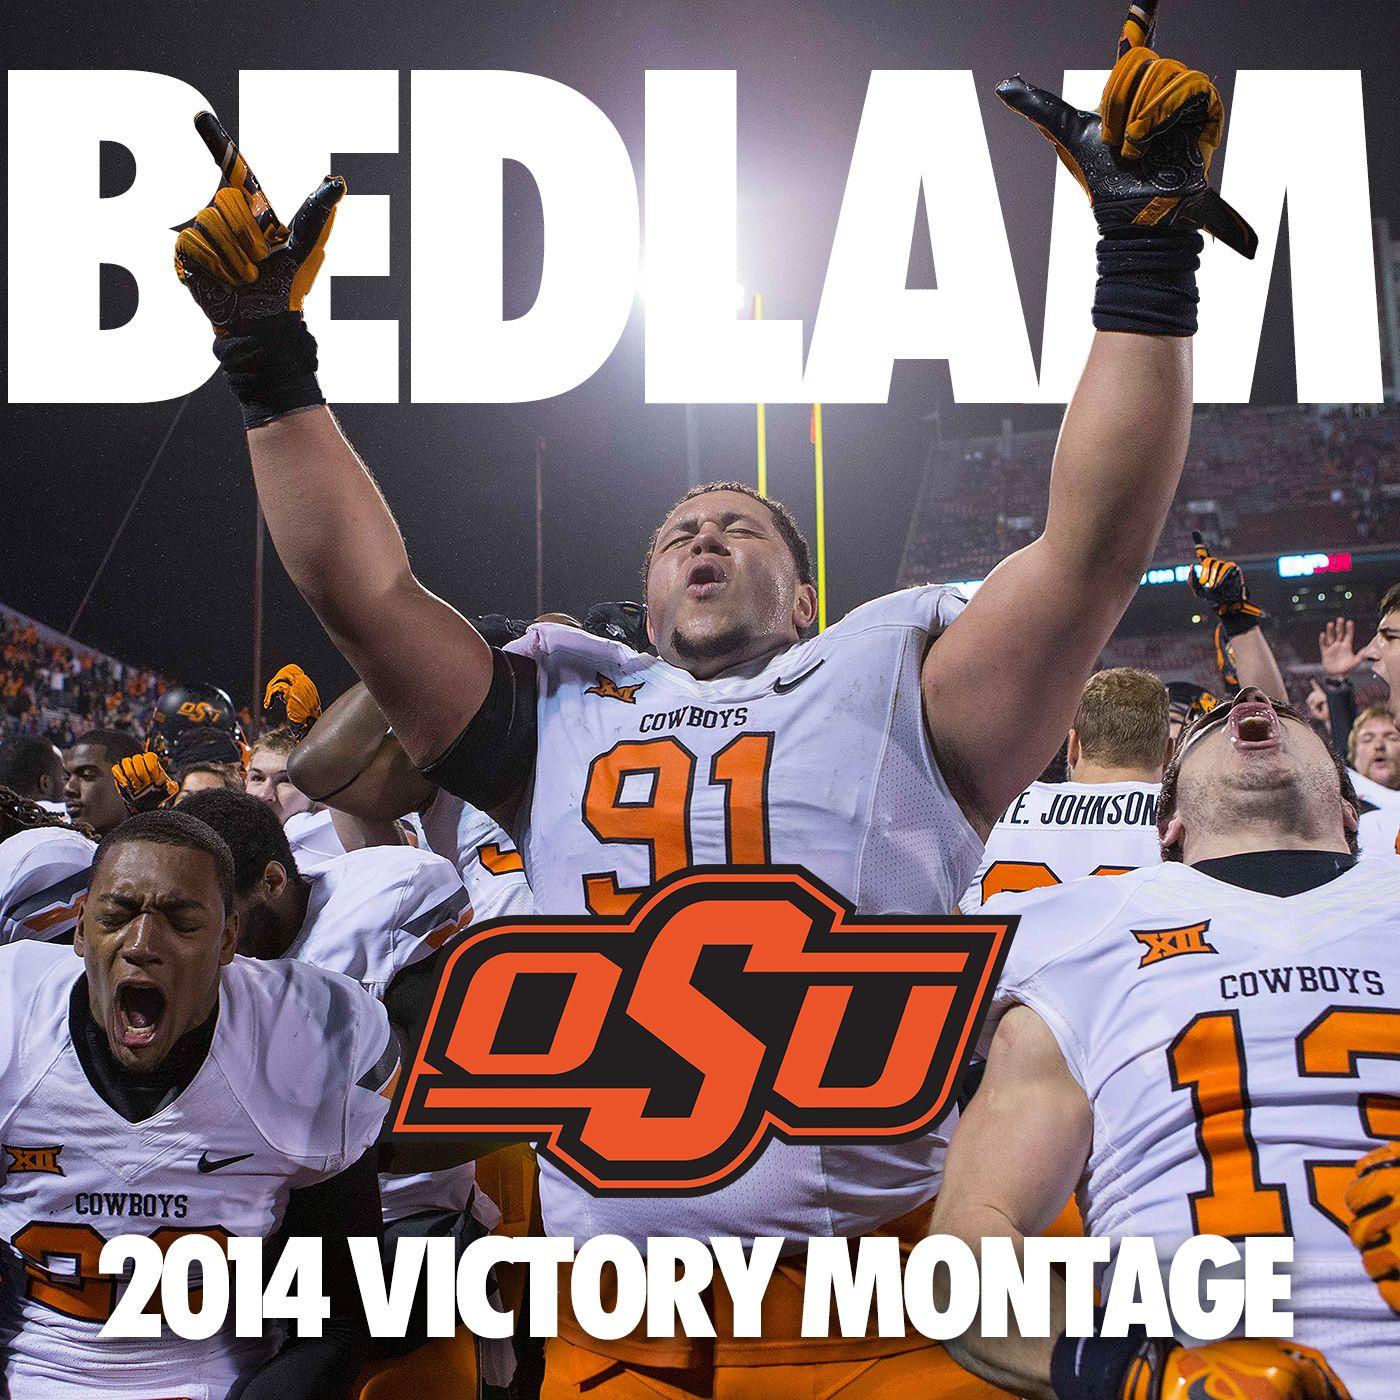 2014 Bedlam Victory Montage